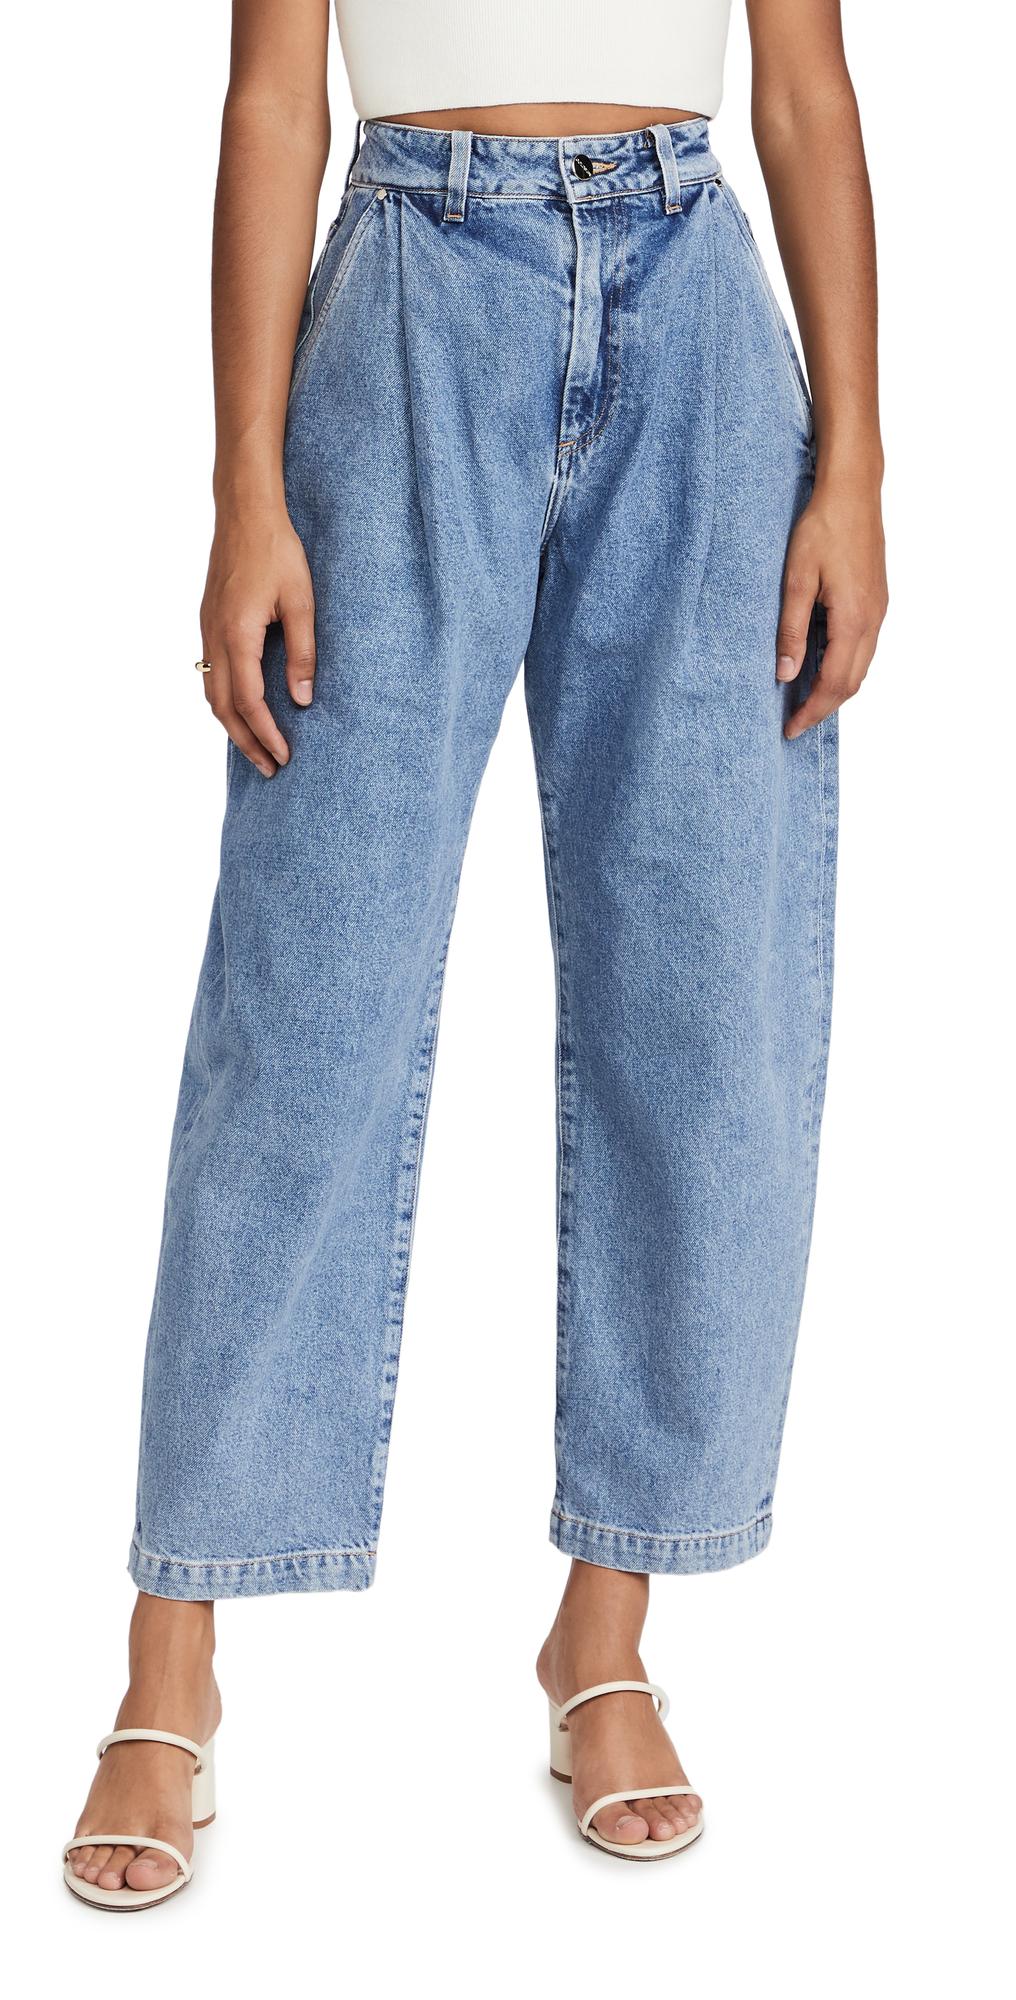 The Dali Trouser Jeans